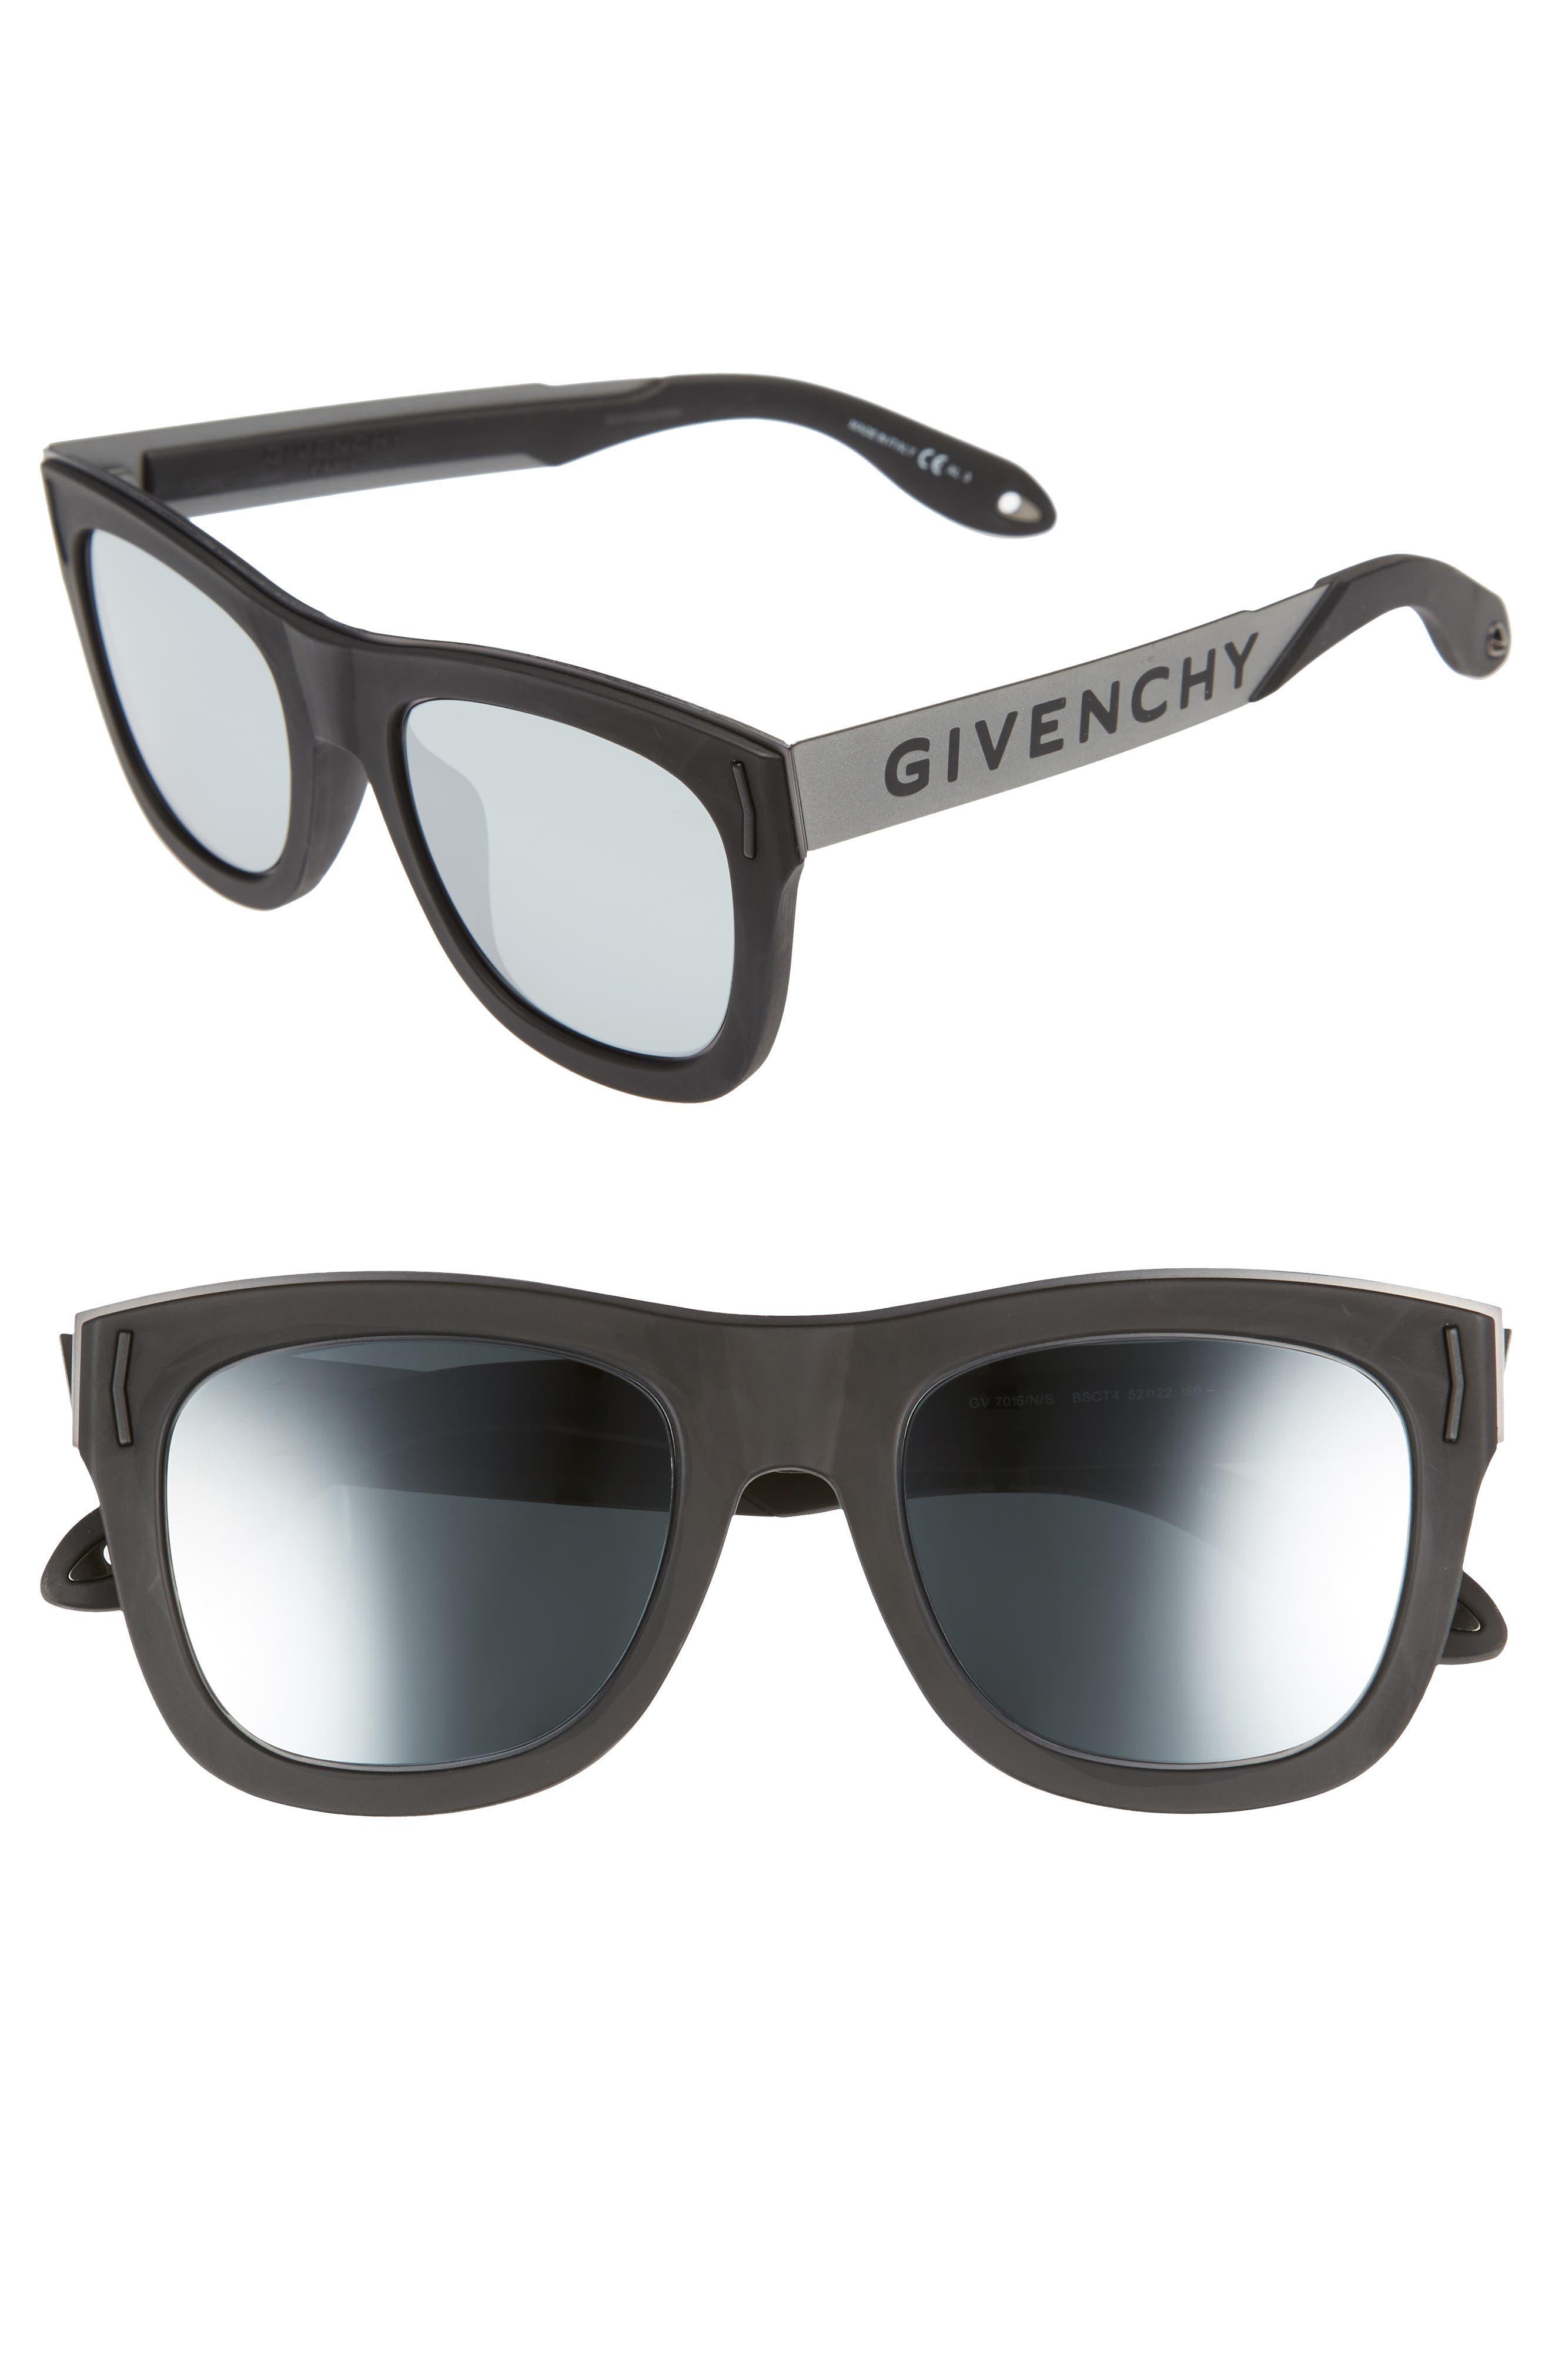 52mm Mirrored Rectangular Sunglasses,                             Main thumbnail 1, color,                             001